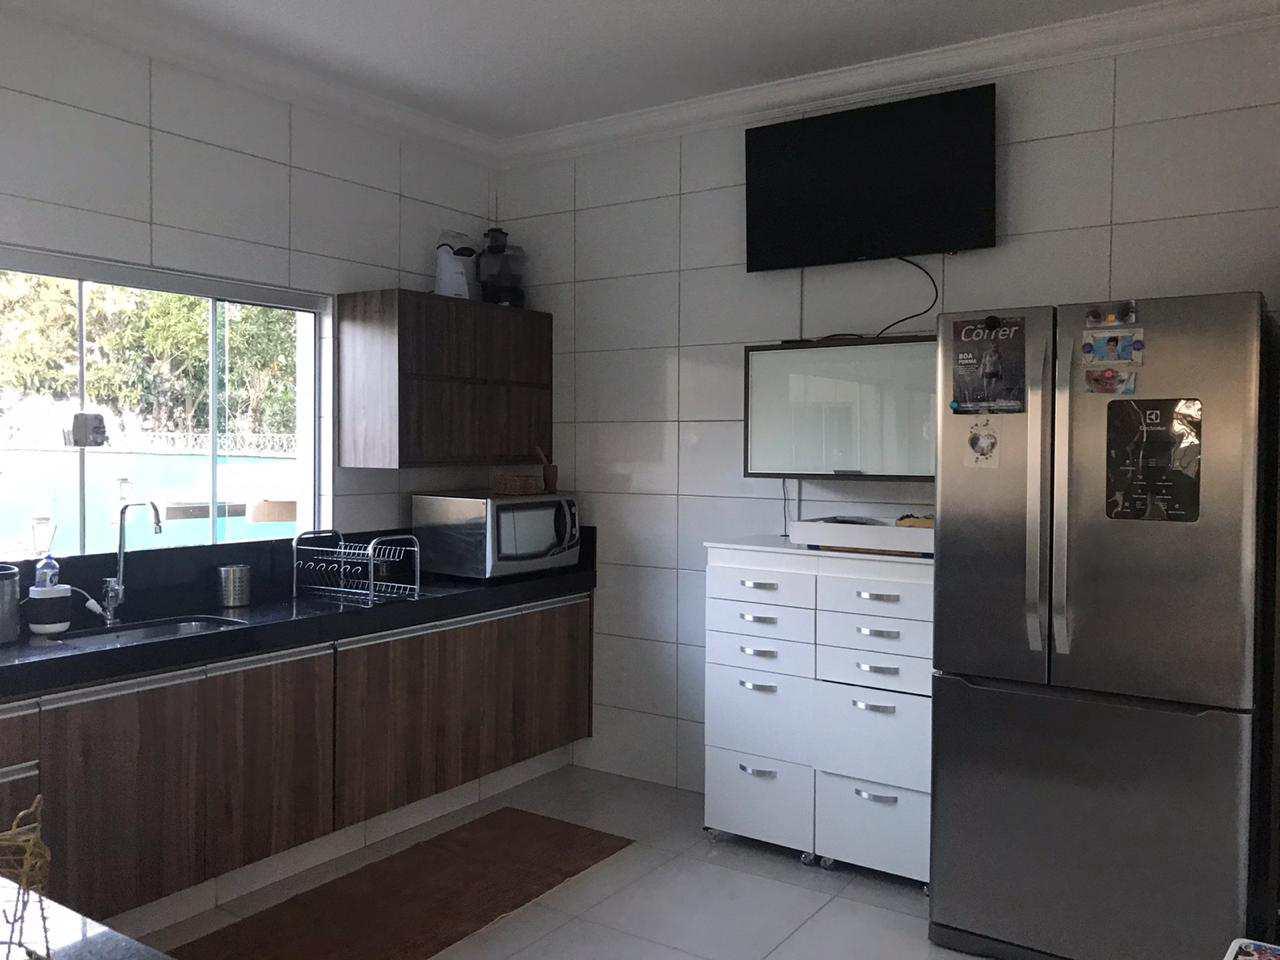 Chácara com 3 dorms, Jardim Palestina, Franca - R$ 900 mil, Cod: 1722767